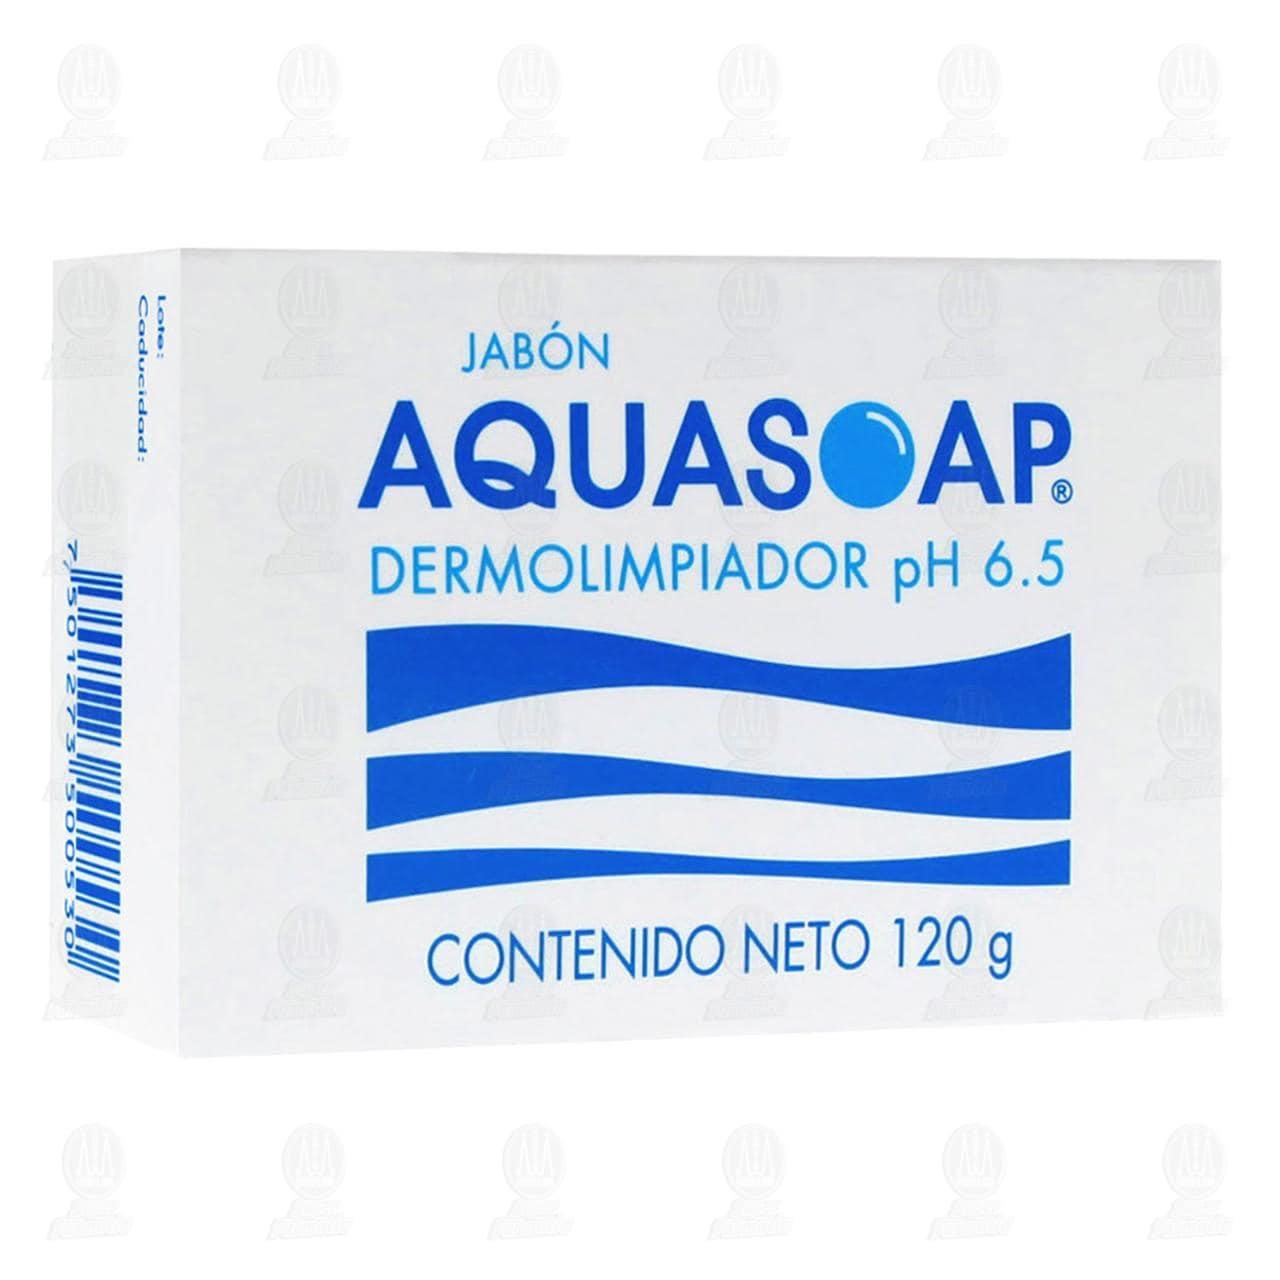 Comprar Aqua Soap PH 6.5 120gr Barra Dermolimpiador en Farmacias Guadalajara